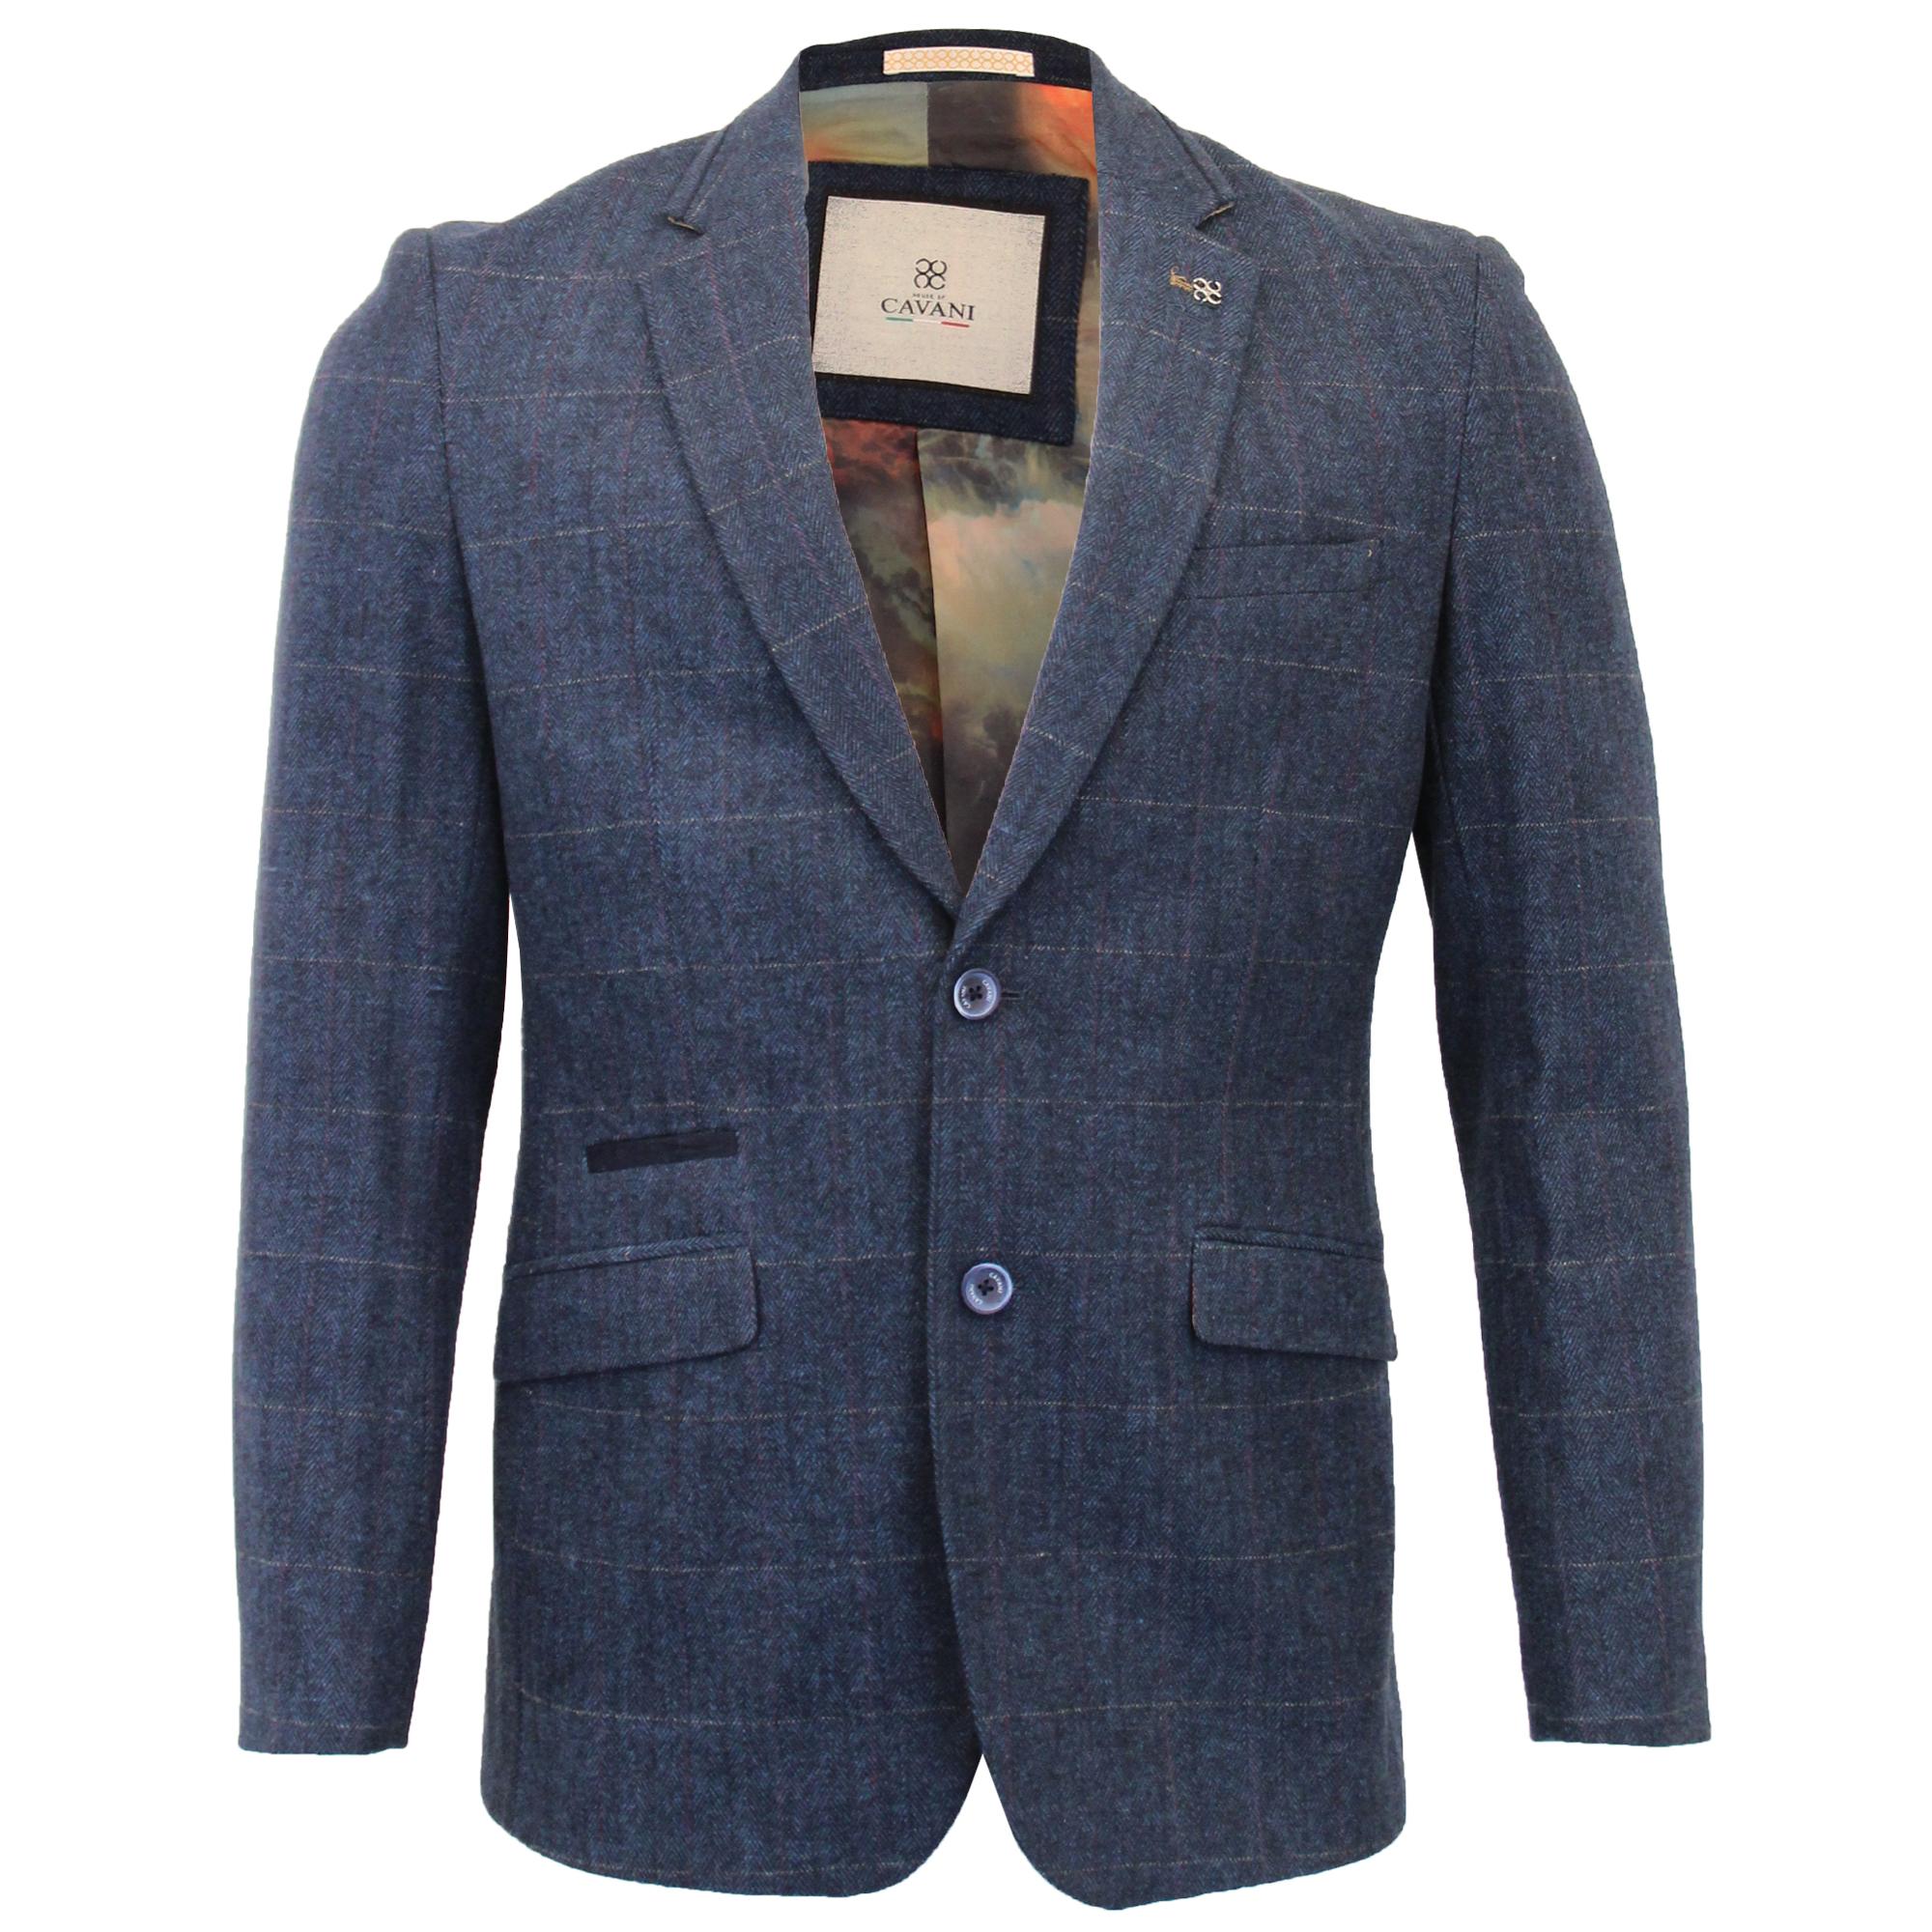 Mens-Wool-Mix-3-Piece-Tweed-Suit-Cavani-CARNEGI-Checked-Peaky-Blinders-Party-New thumbnail 2